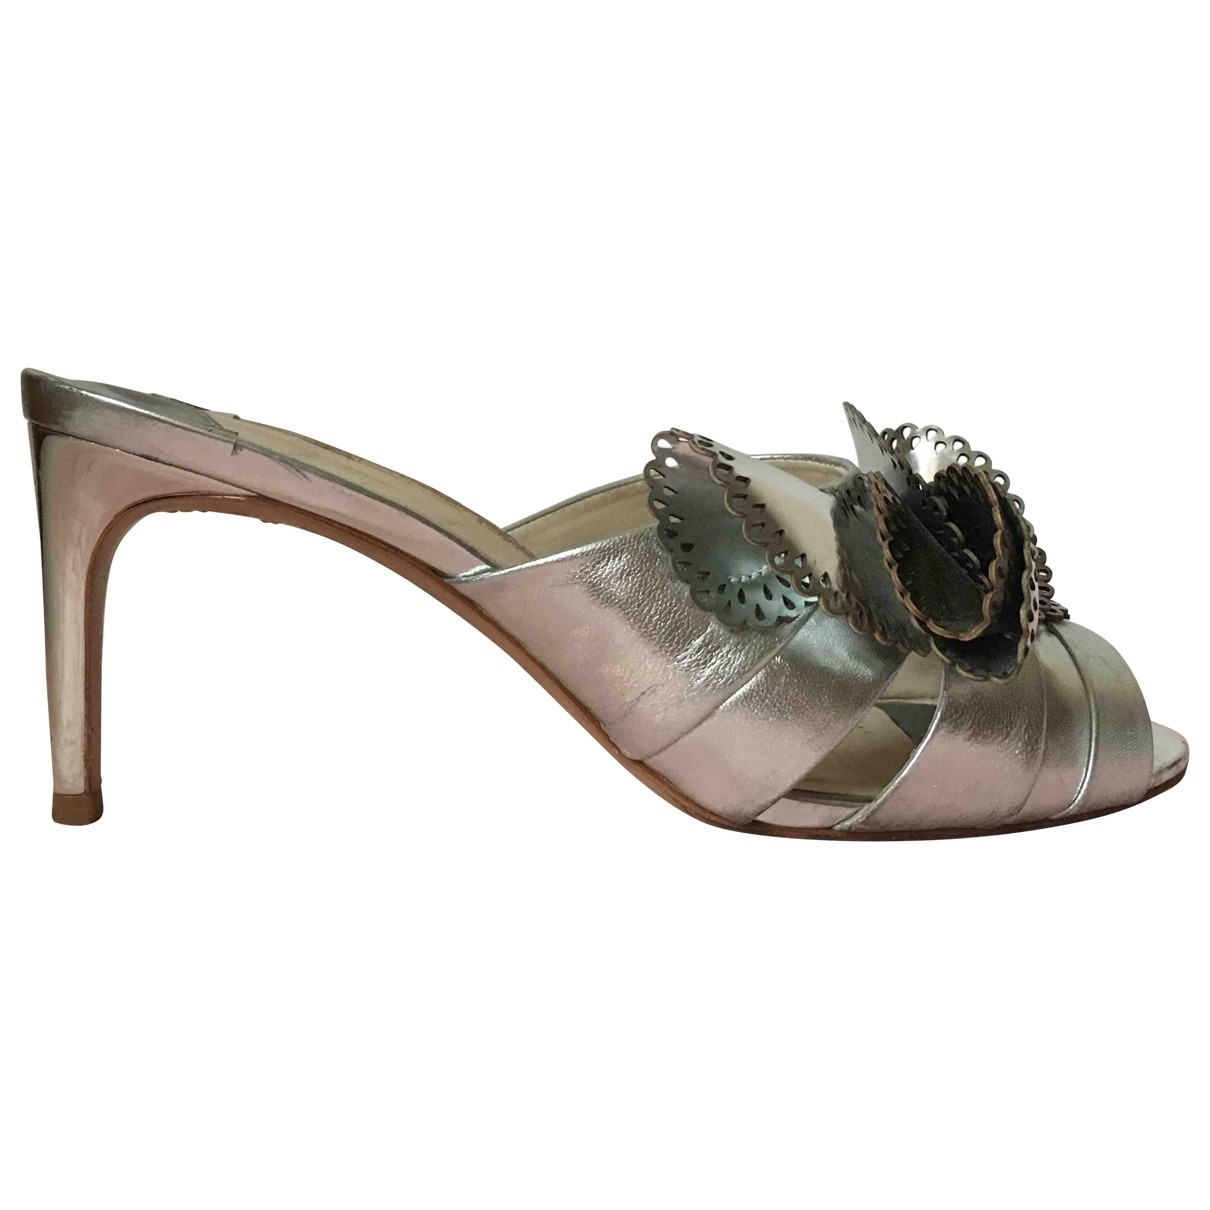 Sophia Webster \N Silver Leather Sandals for Women 38.5 EU